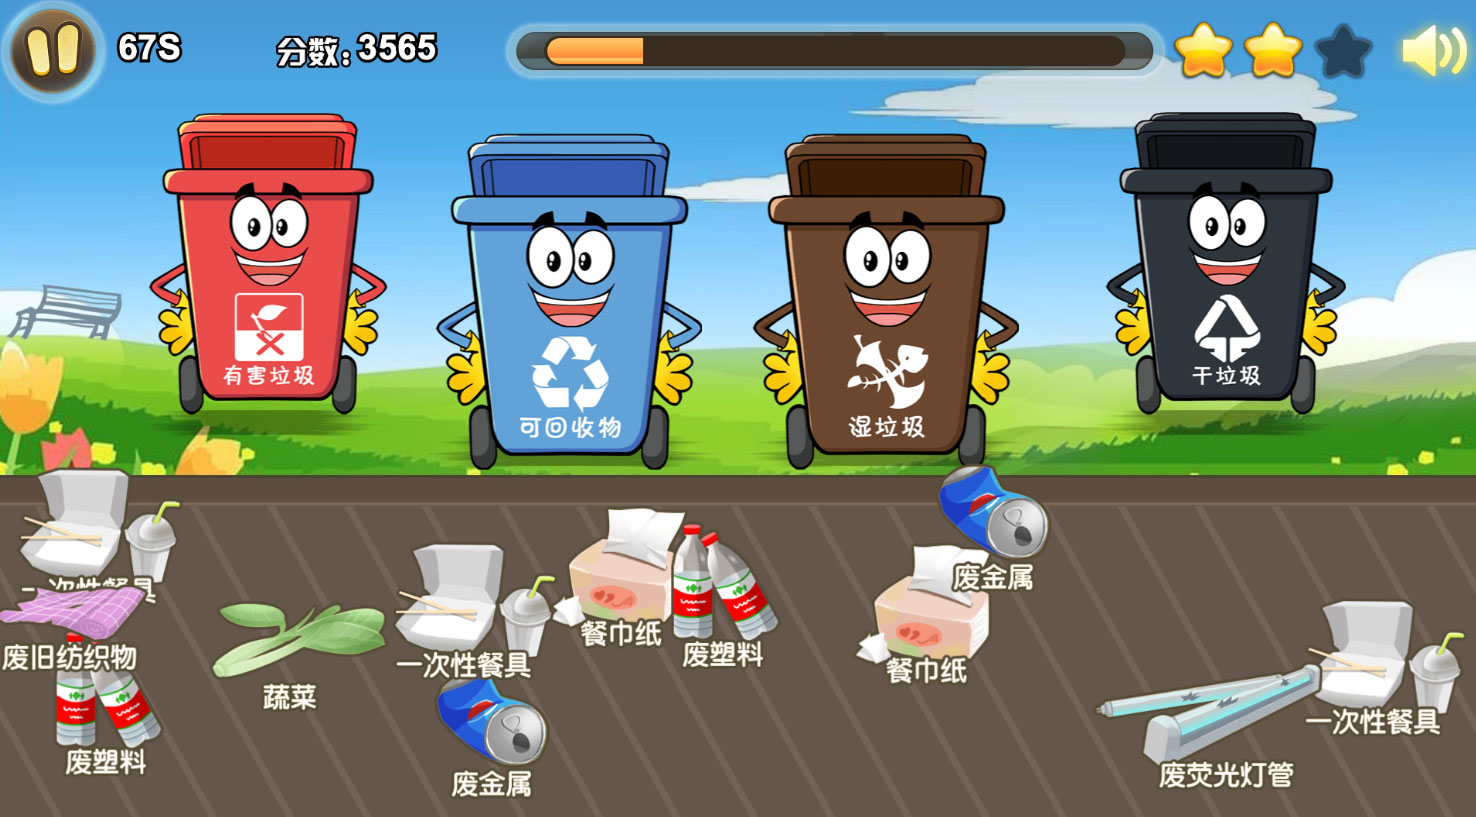 Test Your Trash Sorting Skills